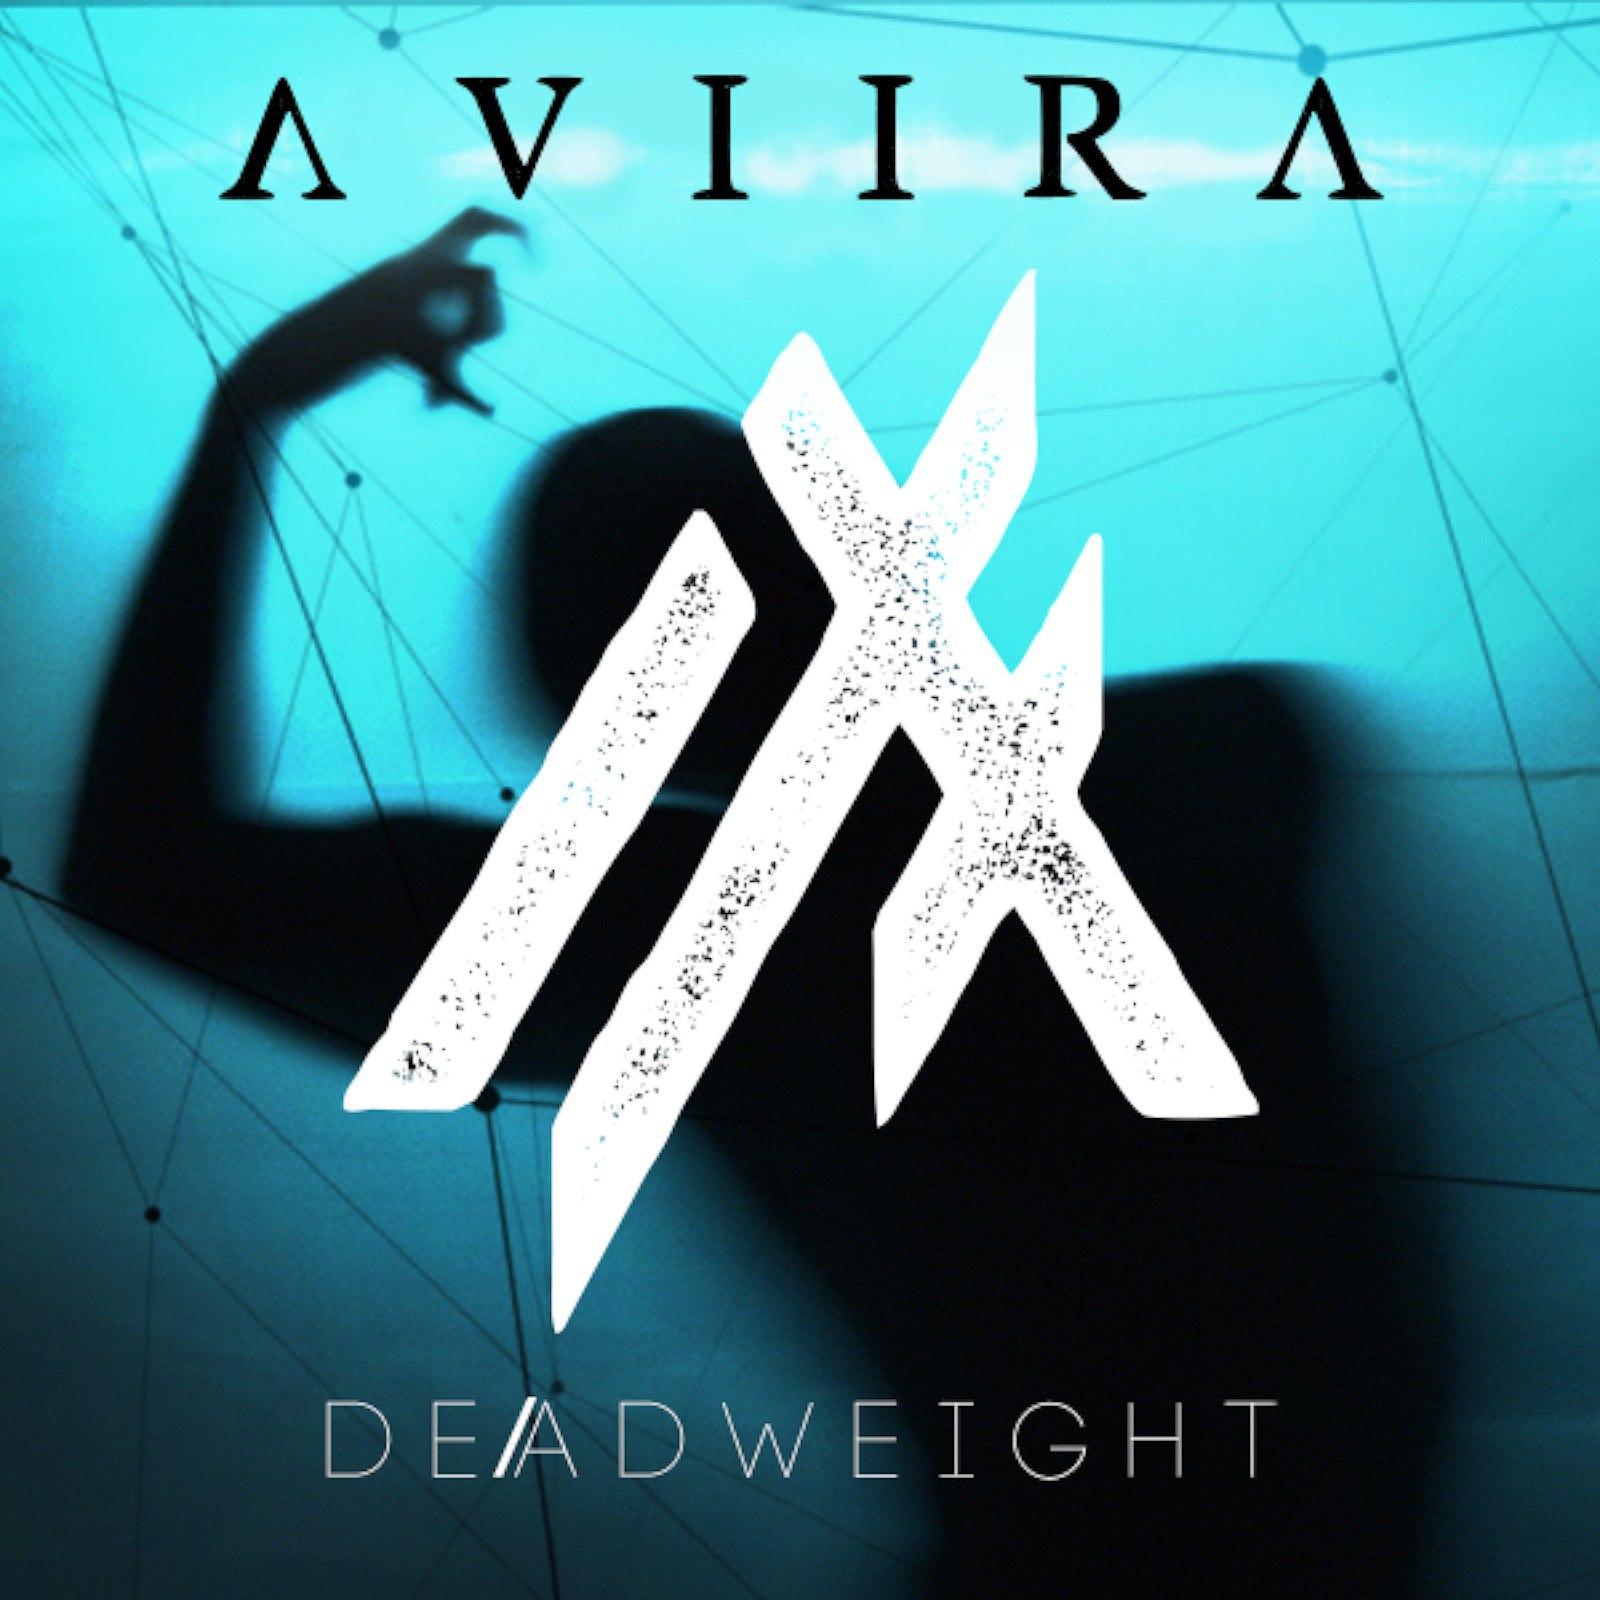 AVIIRA - D E / A D W E I G H T [single] (2017)